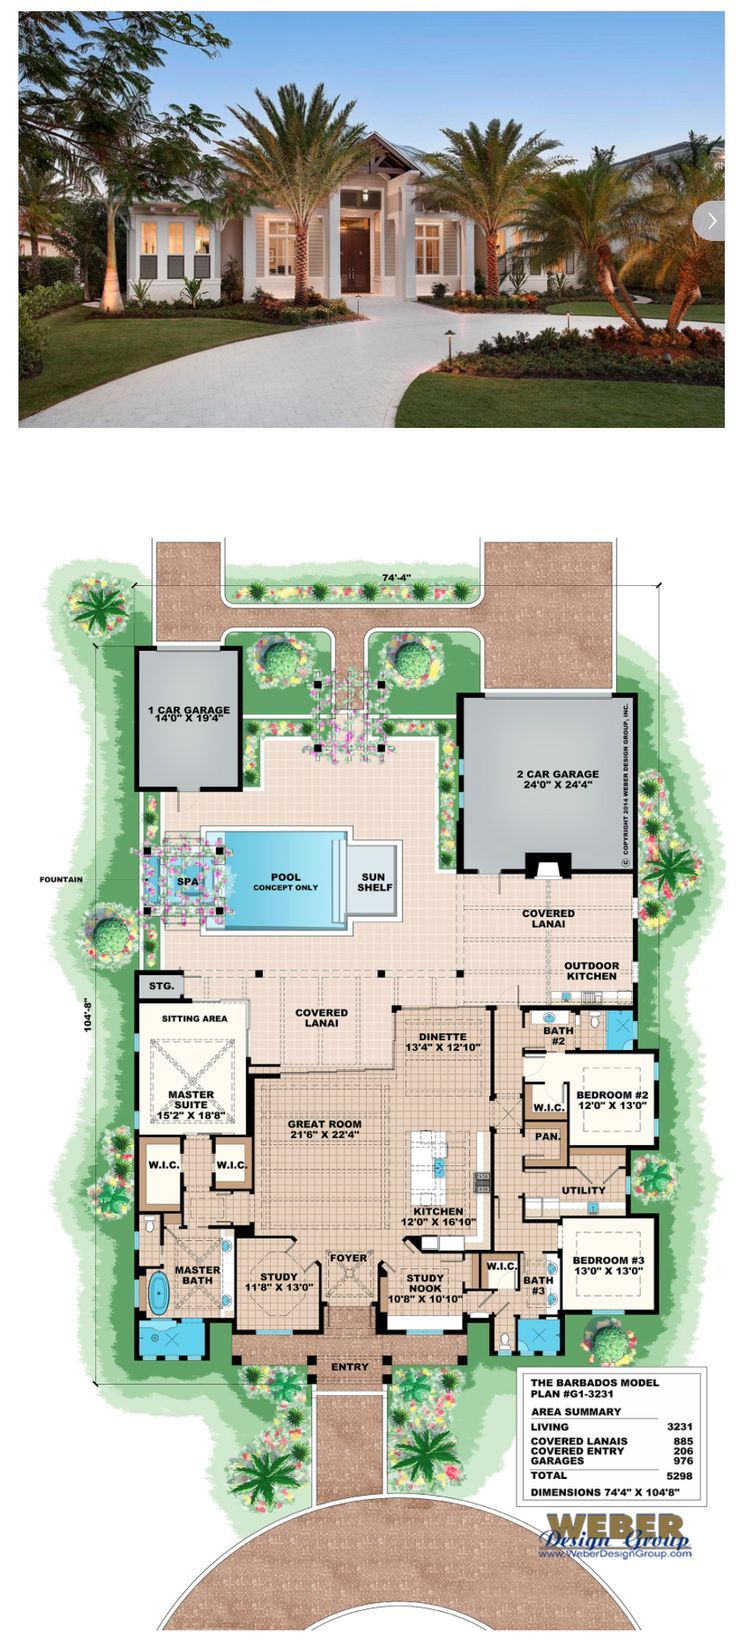 Beach House Plan: Old Florida Coastal & West Indies Style ...